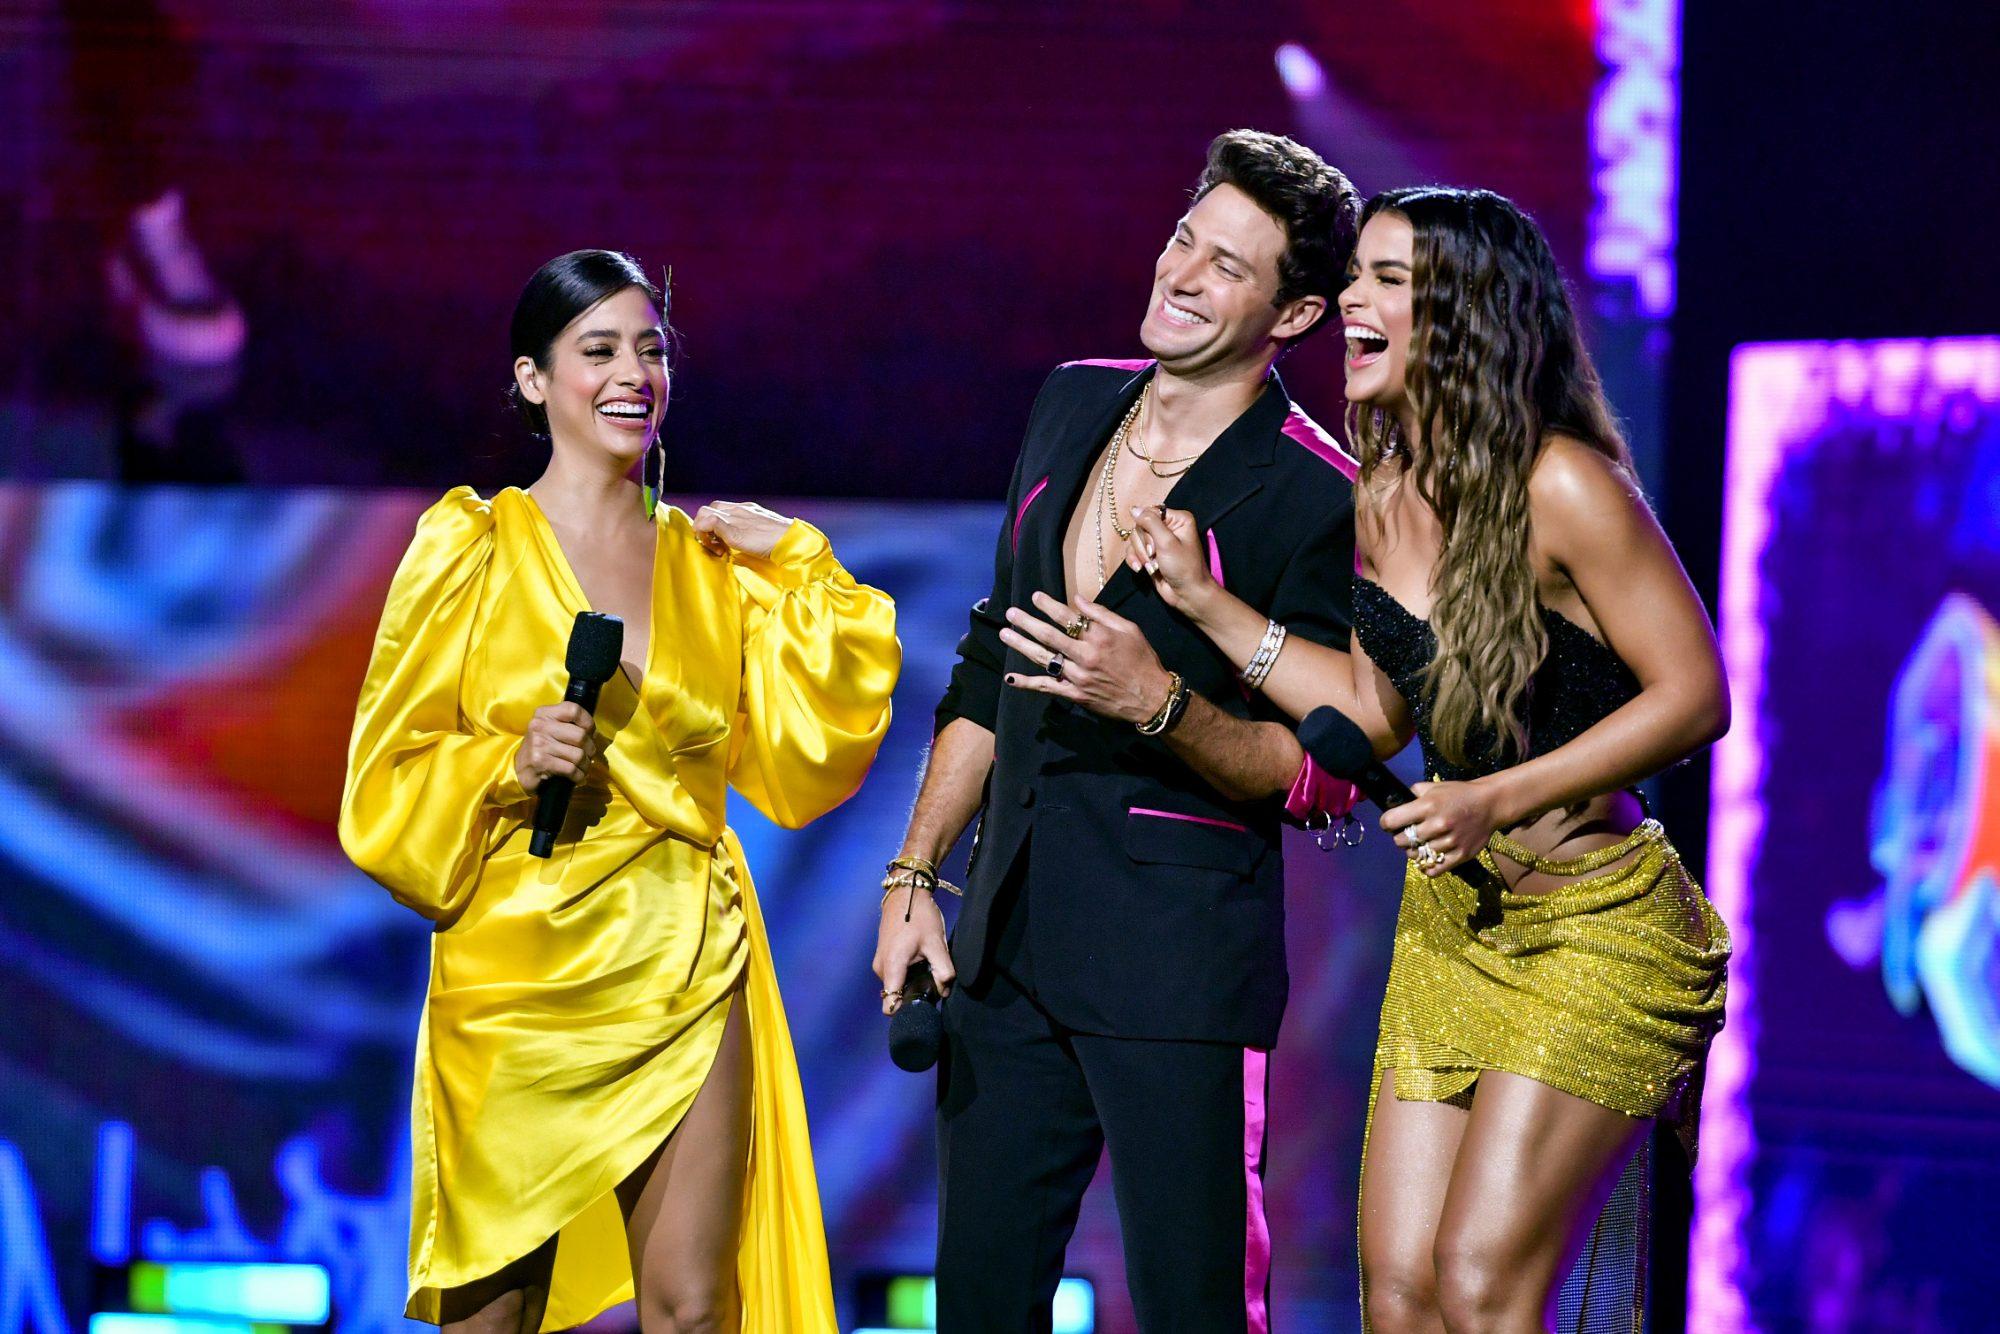 Fátima Molina, Gabriel Coronel, and Clarissa Molina speak onstage at Premios Juventud 2021 at Watsco Center